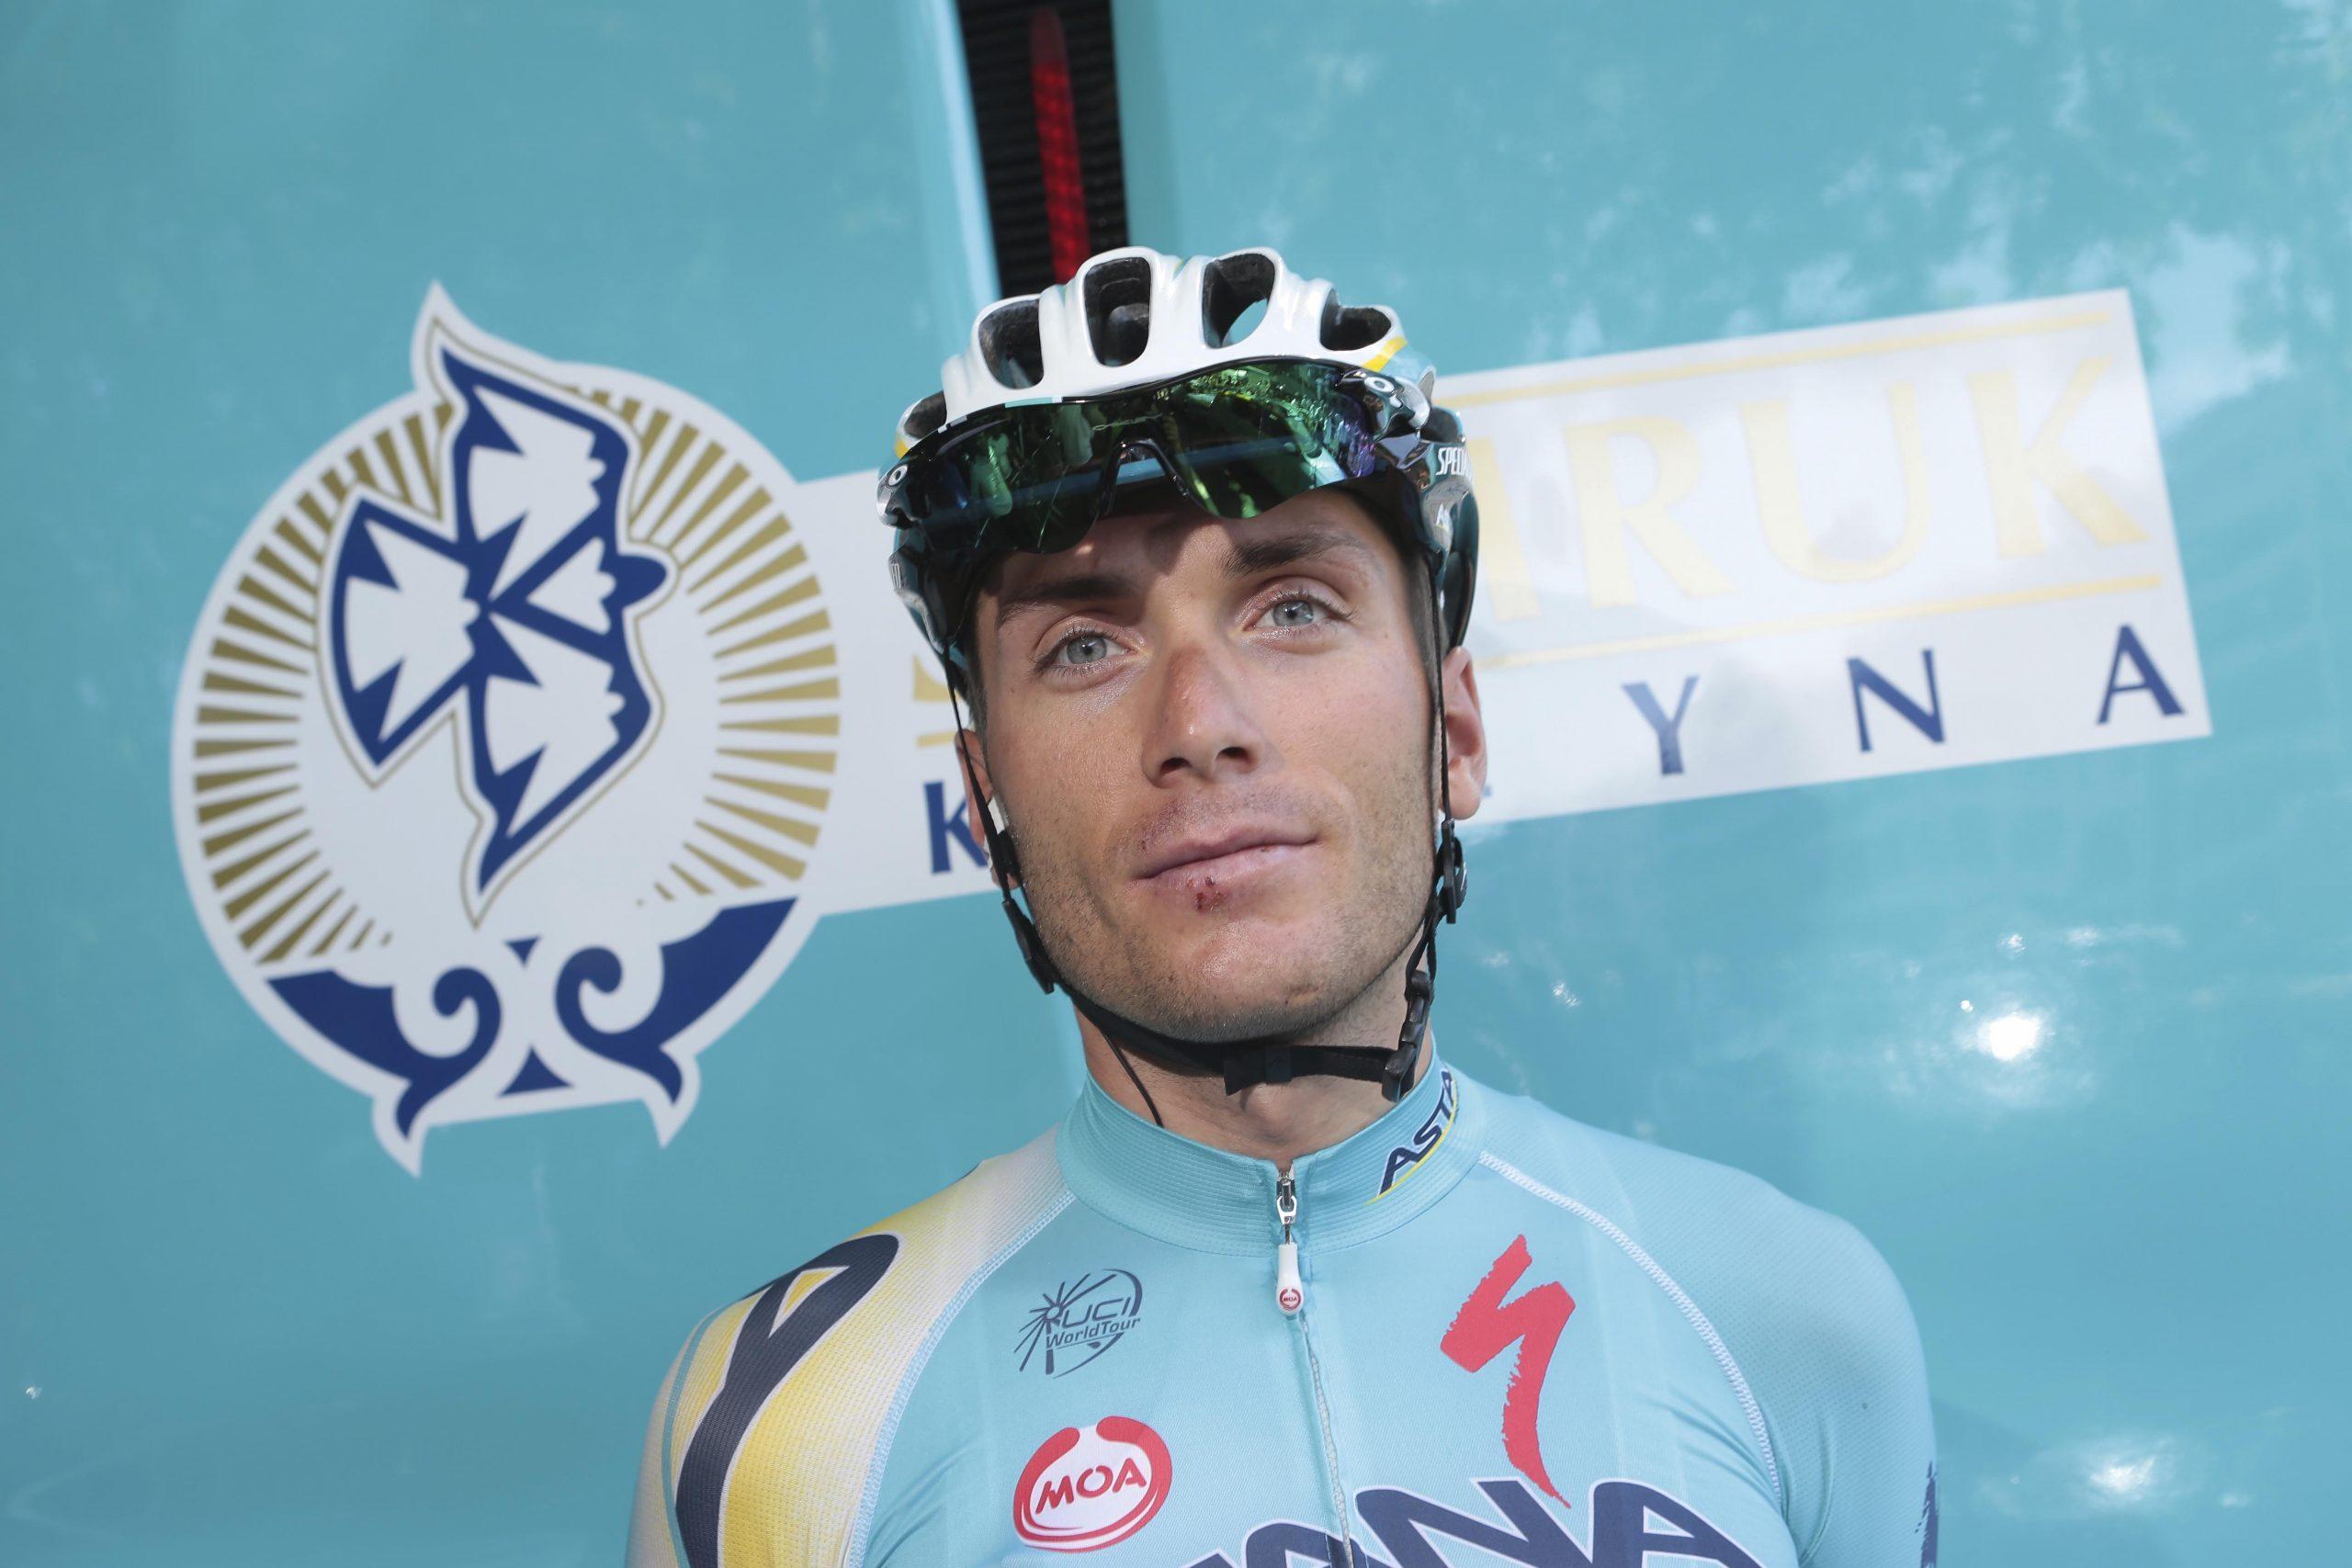 En syklist i eksil